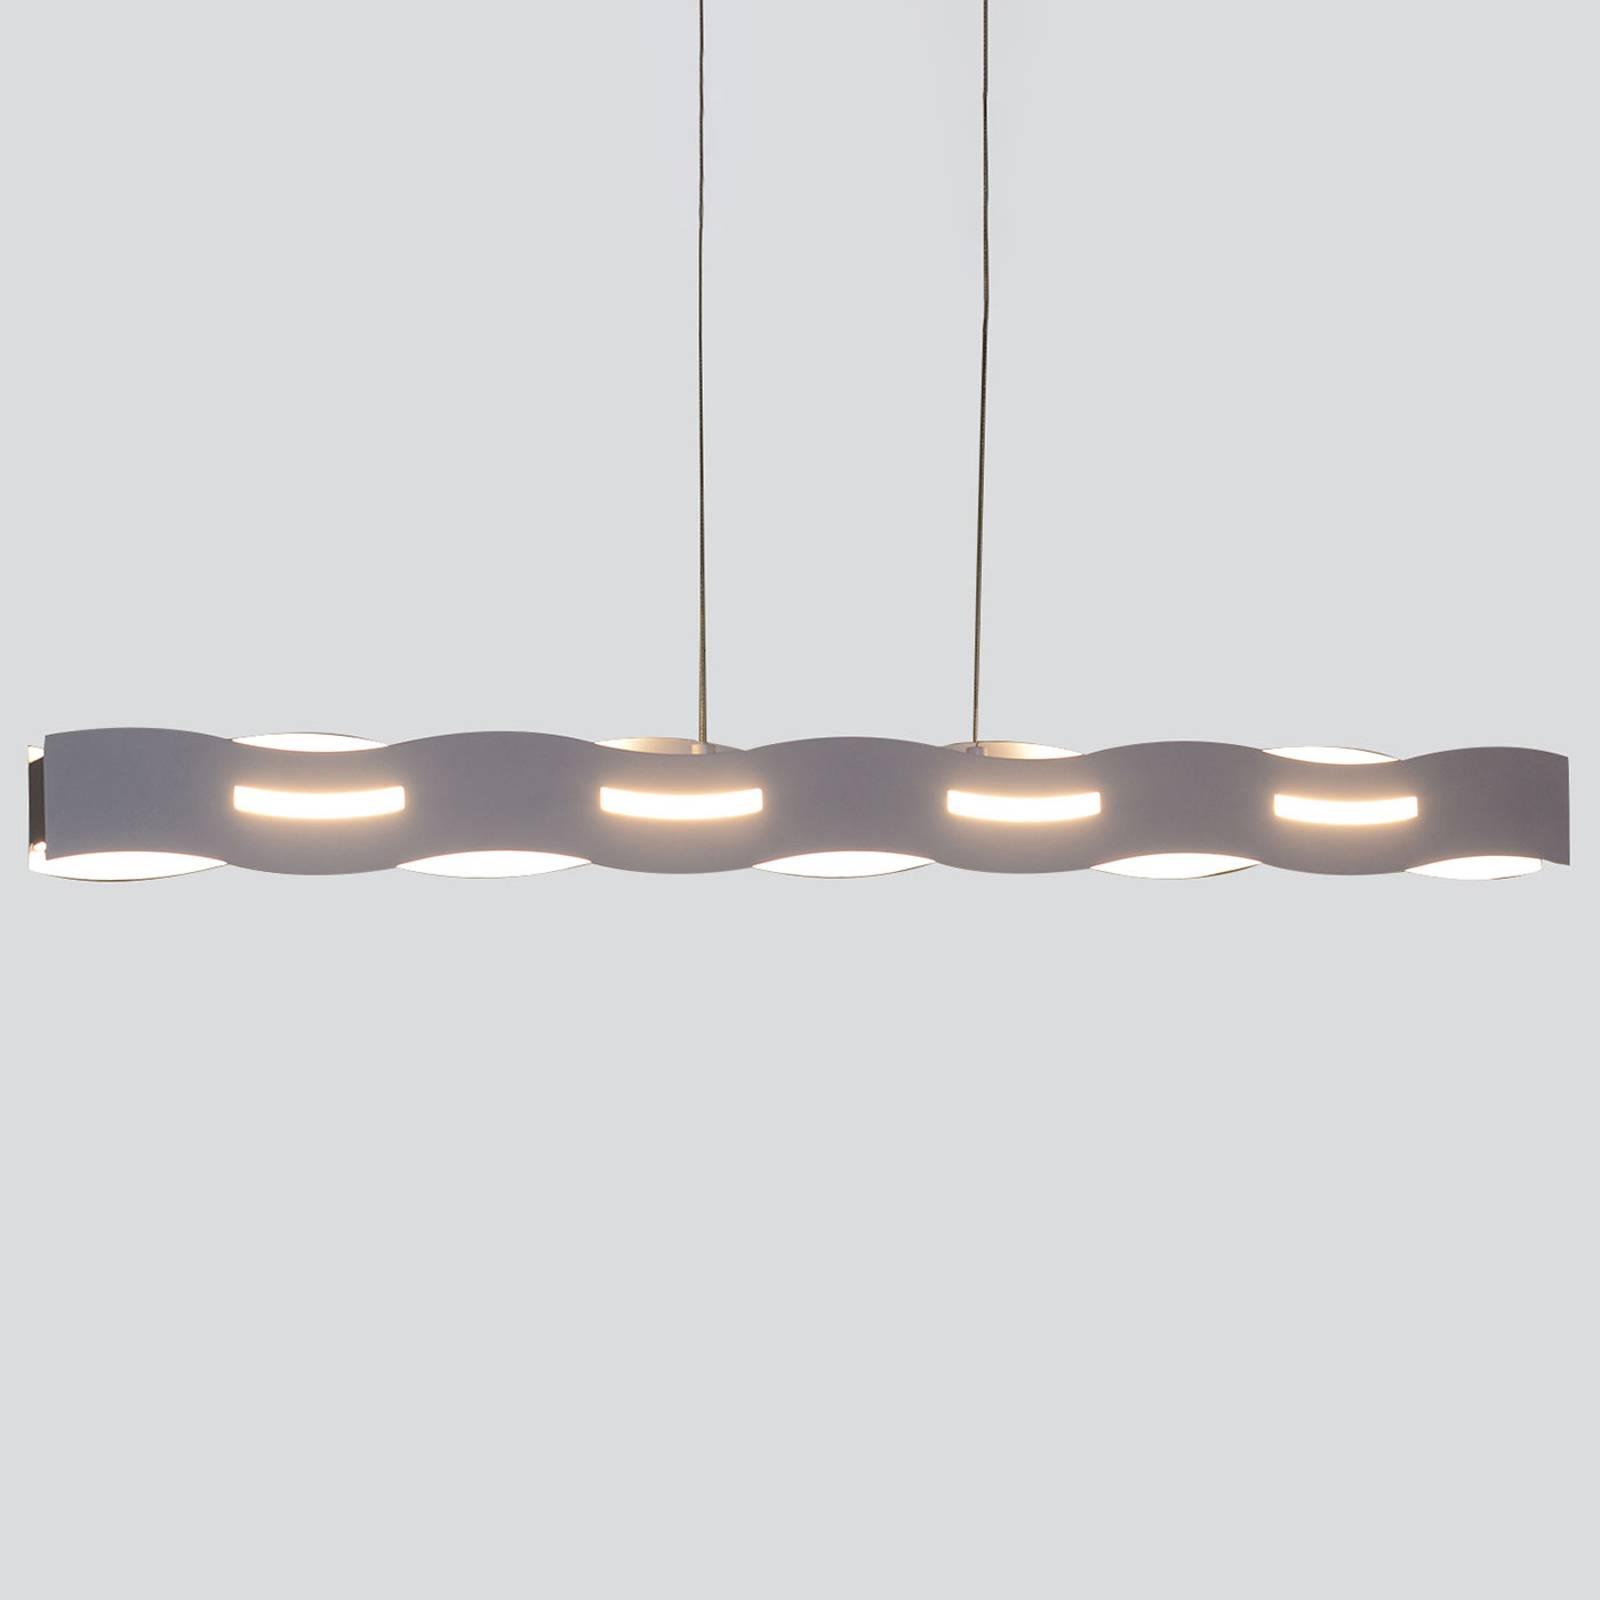 LED-riippuvalaisin Wave, nikkeli